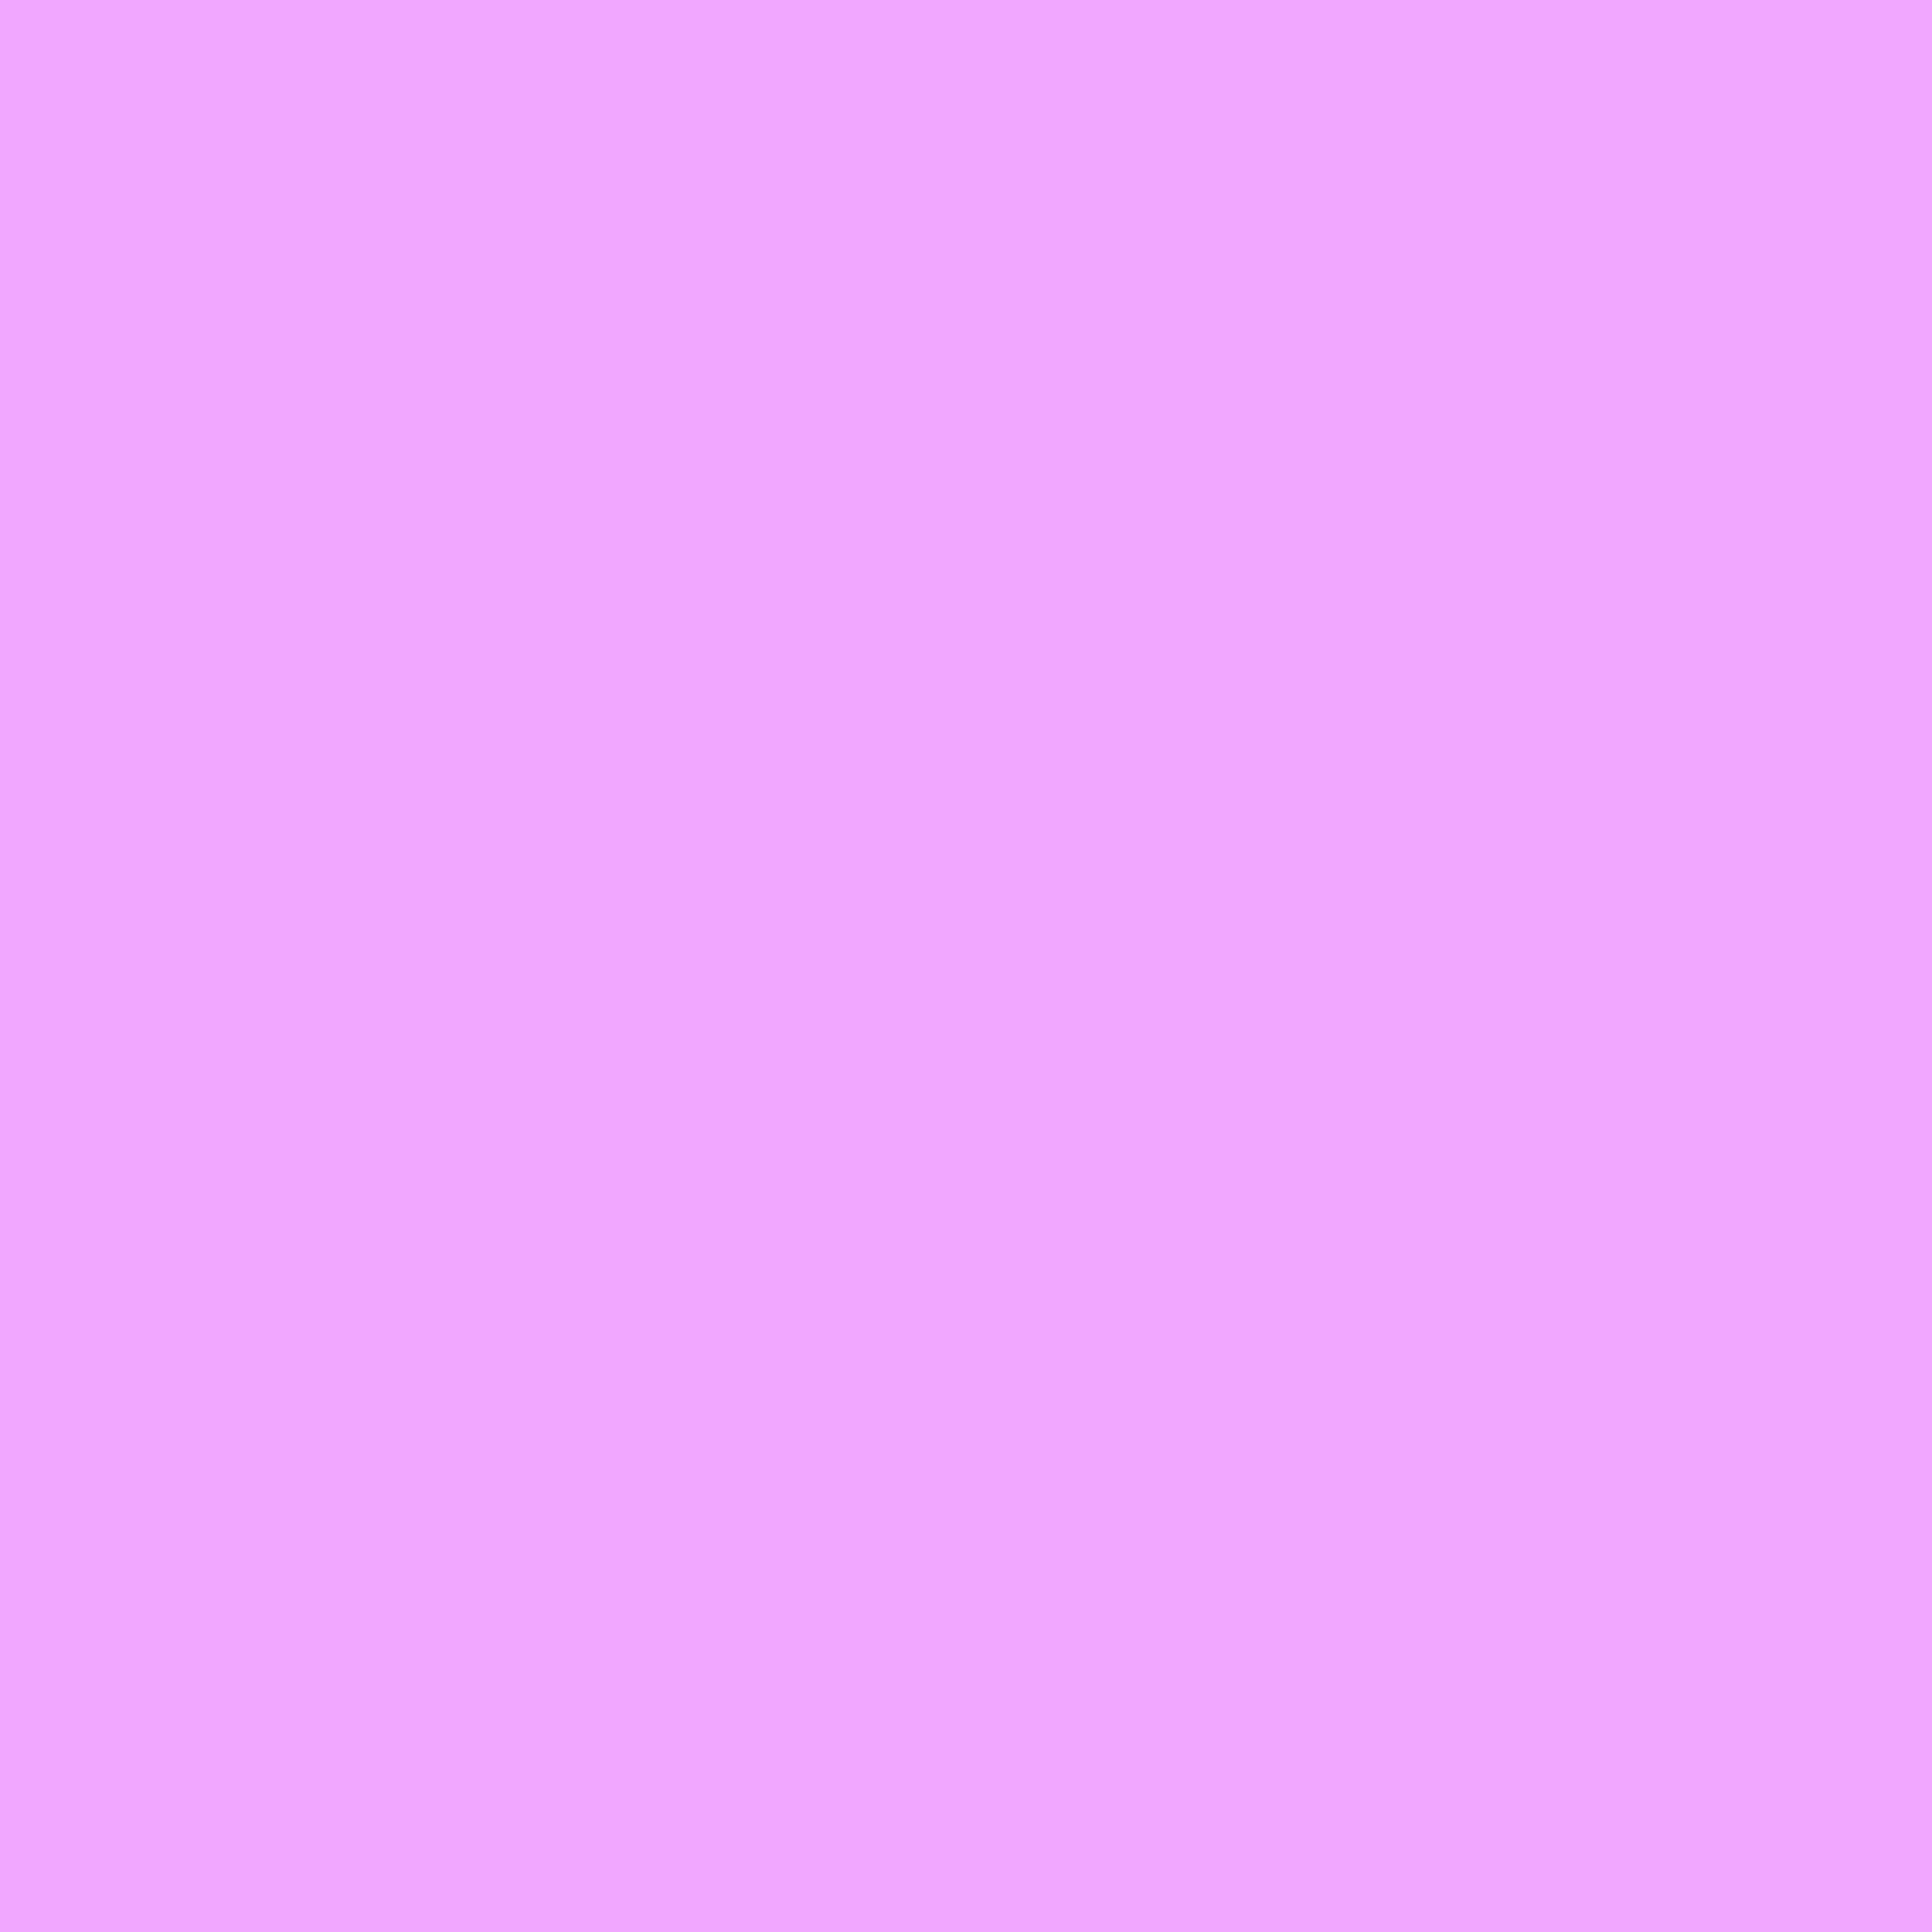 2732x2732 Rich Brilliant Lavender Solid Color Background